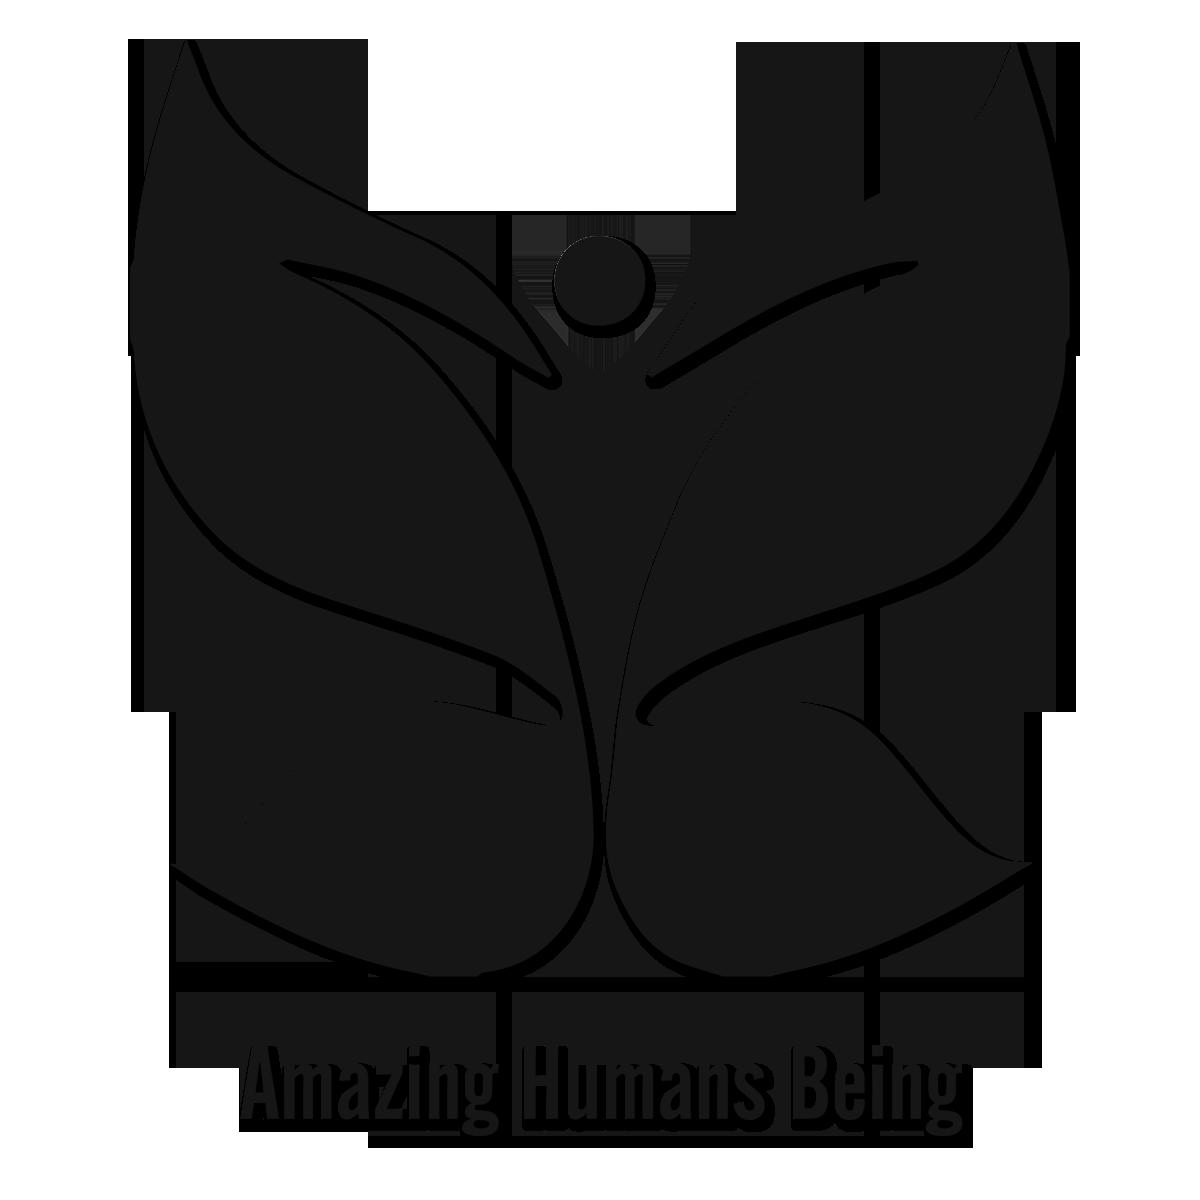 AHB Logo Fina Smalll.png